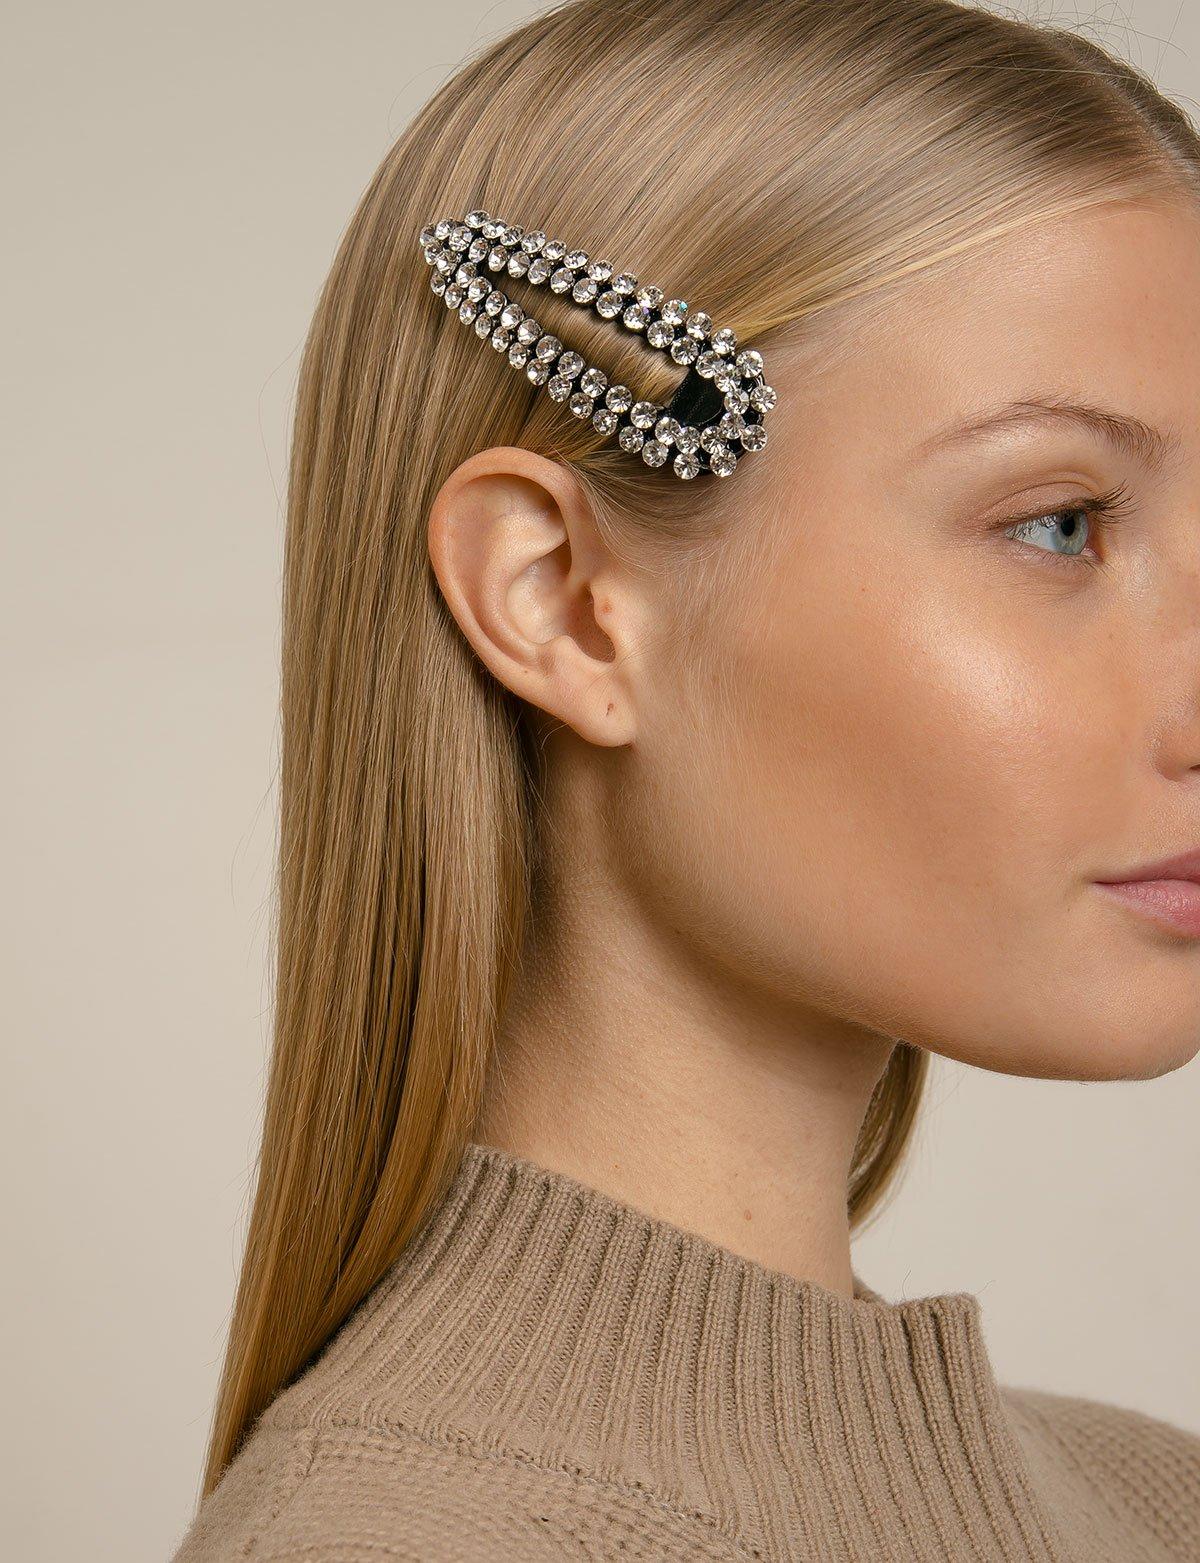 Gold Single Bar Clip In End Barrette Hair Clips Grips Slides